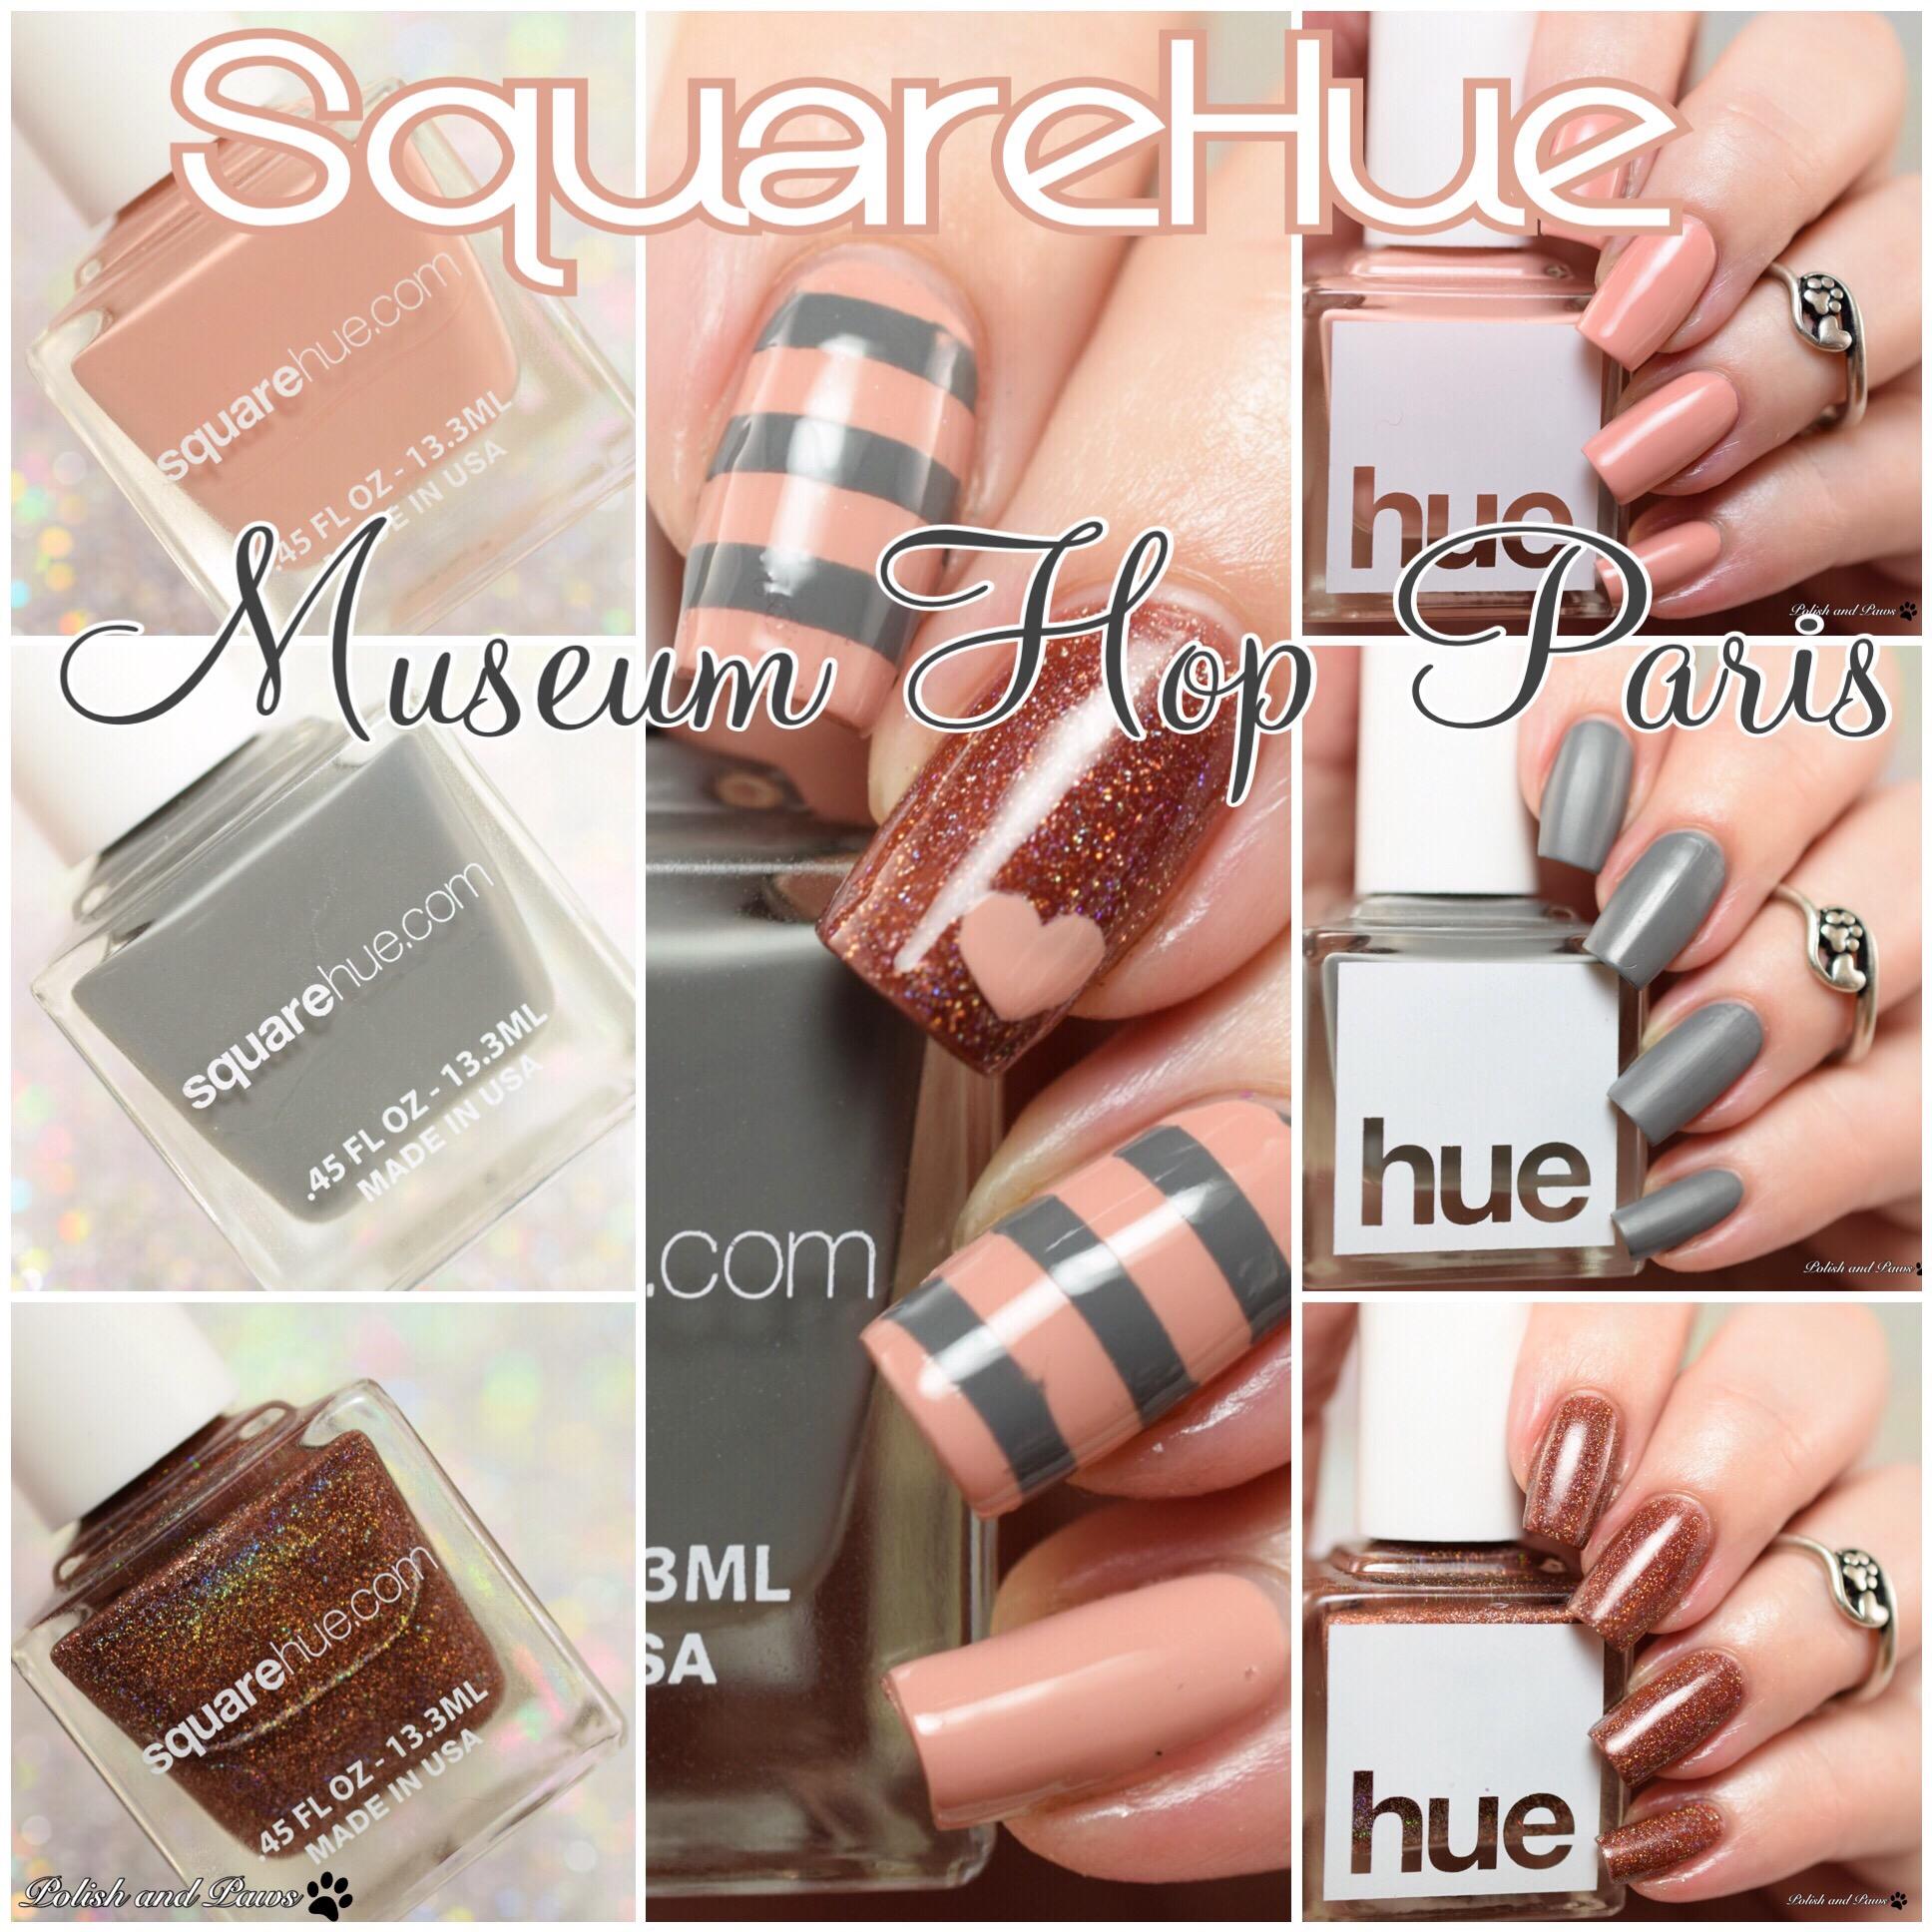 Square Hue Museum Hop Paris